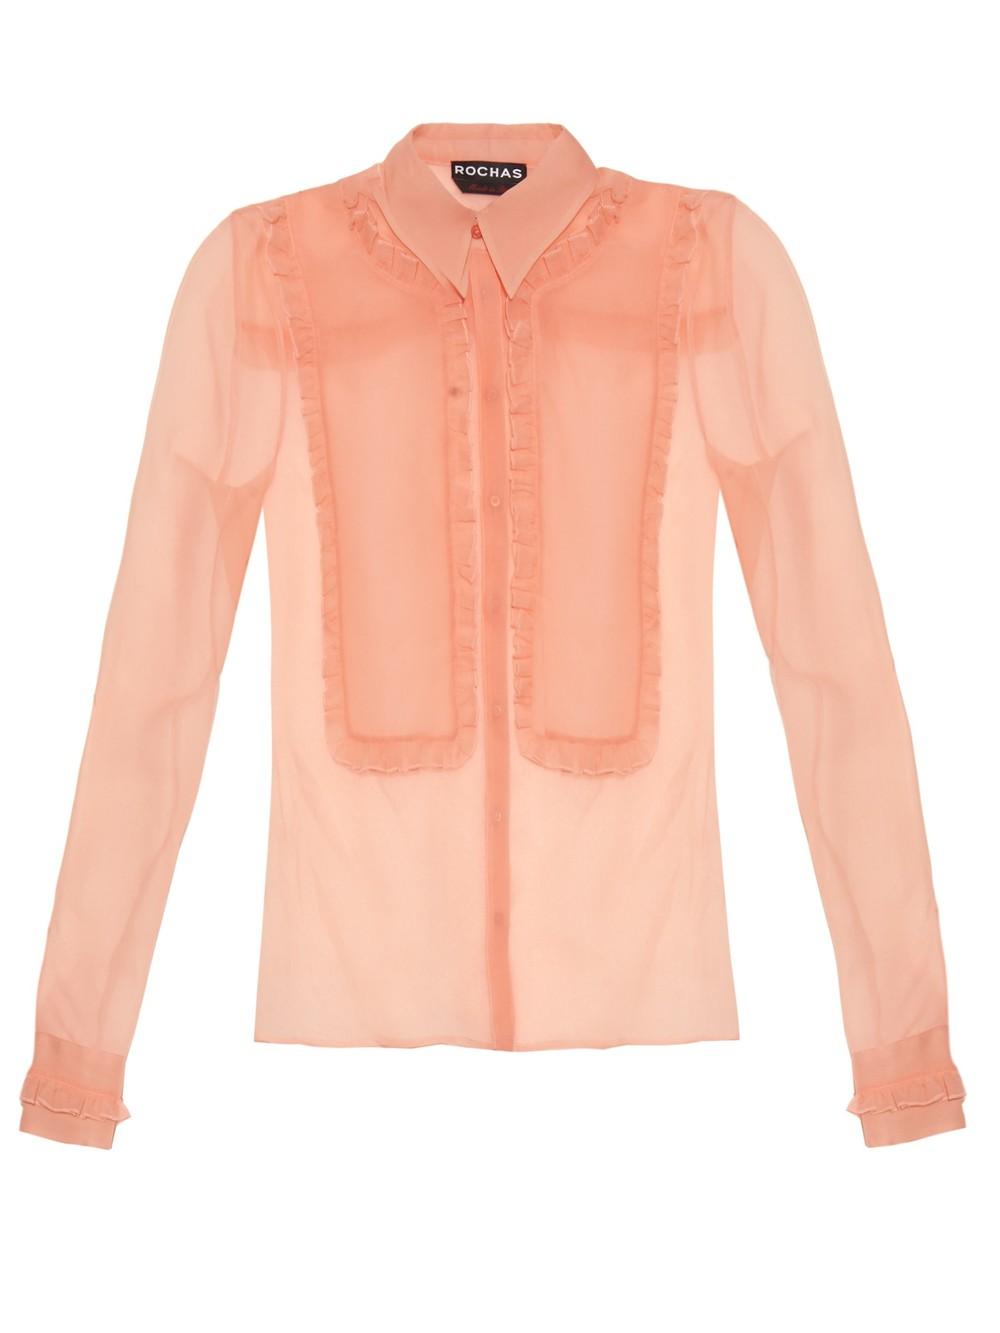 Rochas Silk-Organza Ruffle Trimmed Shirt